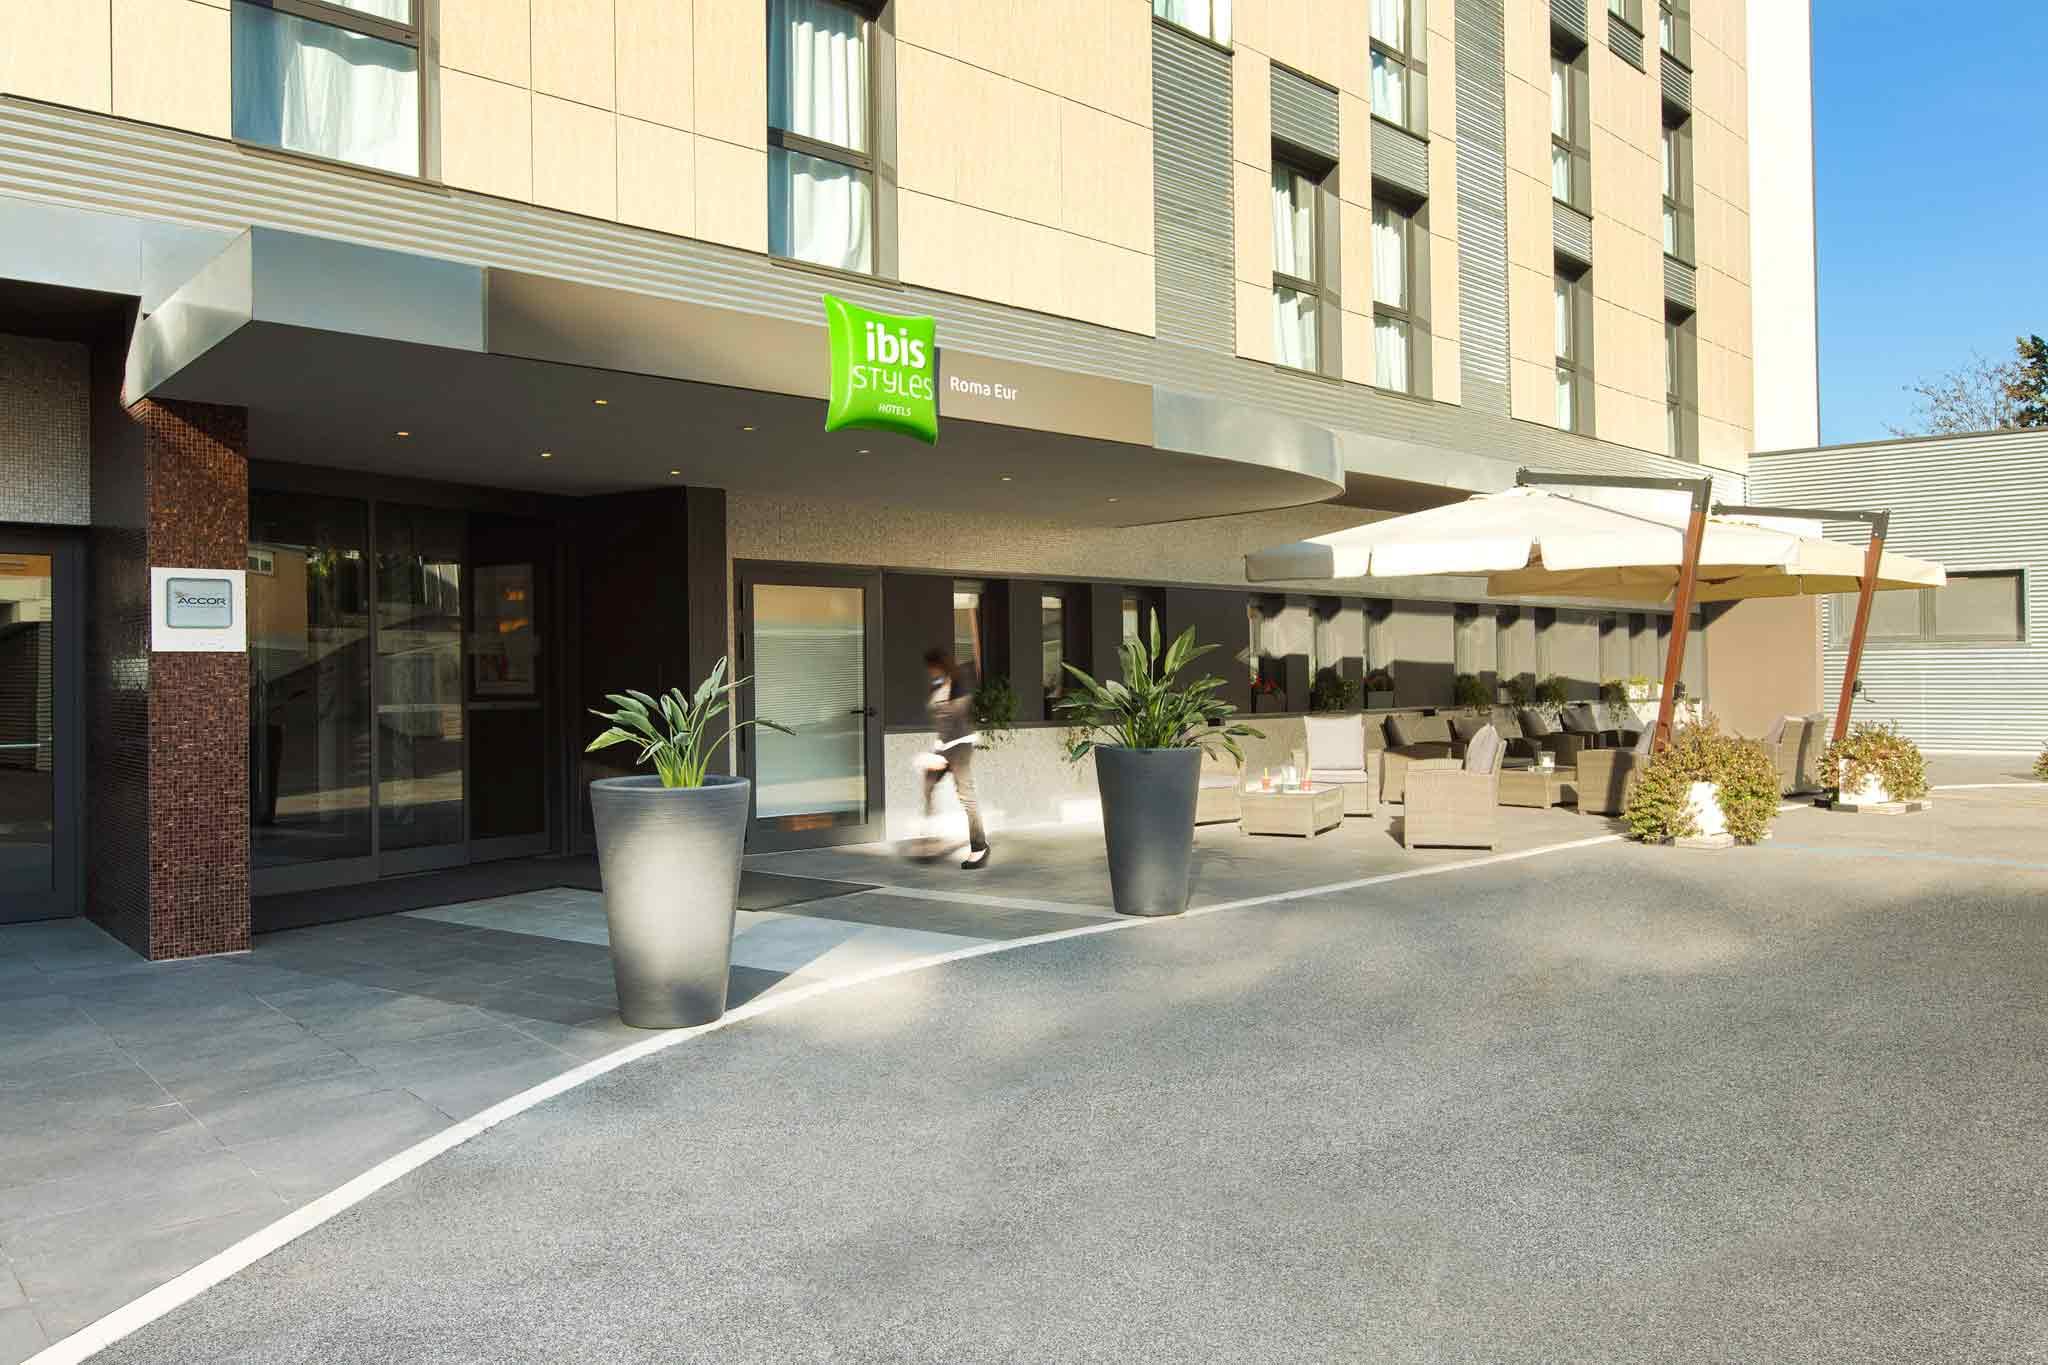 Hotel - ibis Styles Rom Eur